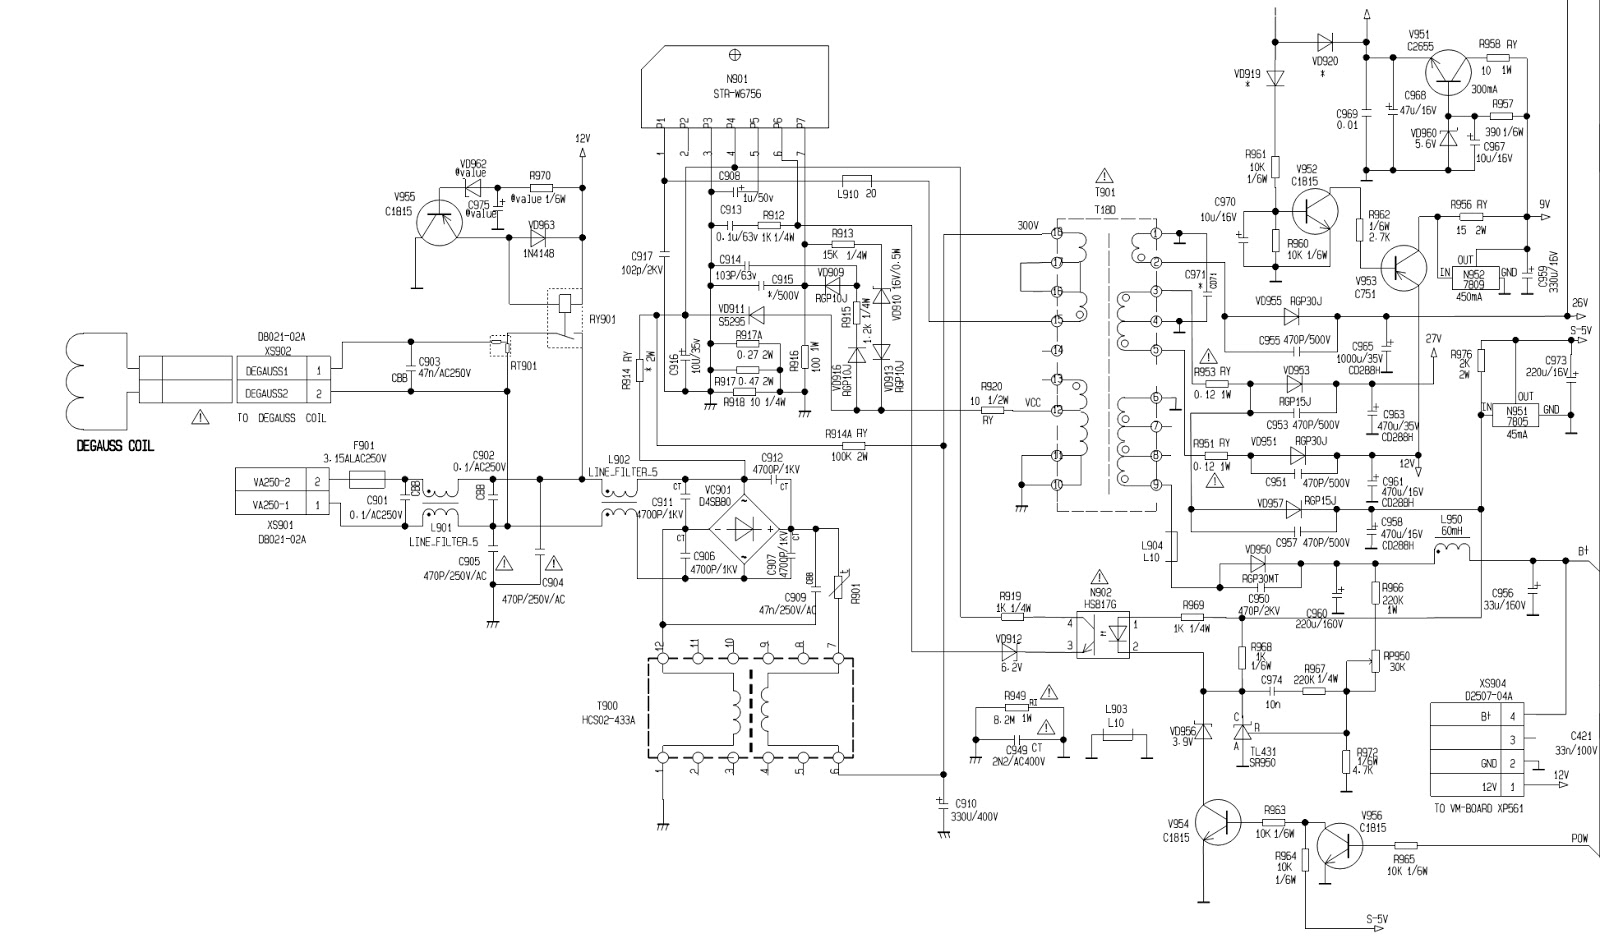 small resolution of toshiba air conditioner wiring diagram wiring diagram main pc board mcc713 toshiba ras10sax user